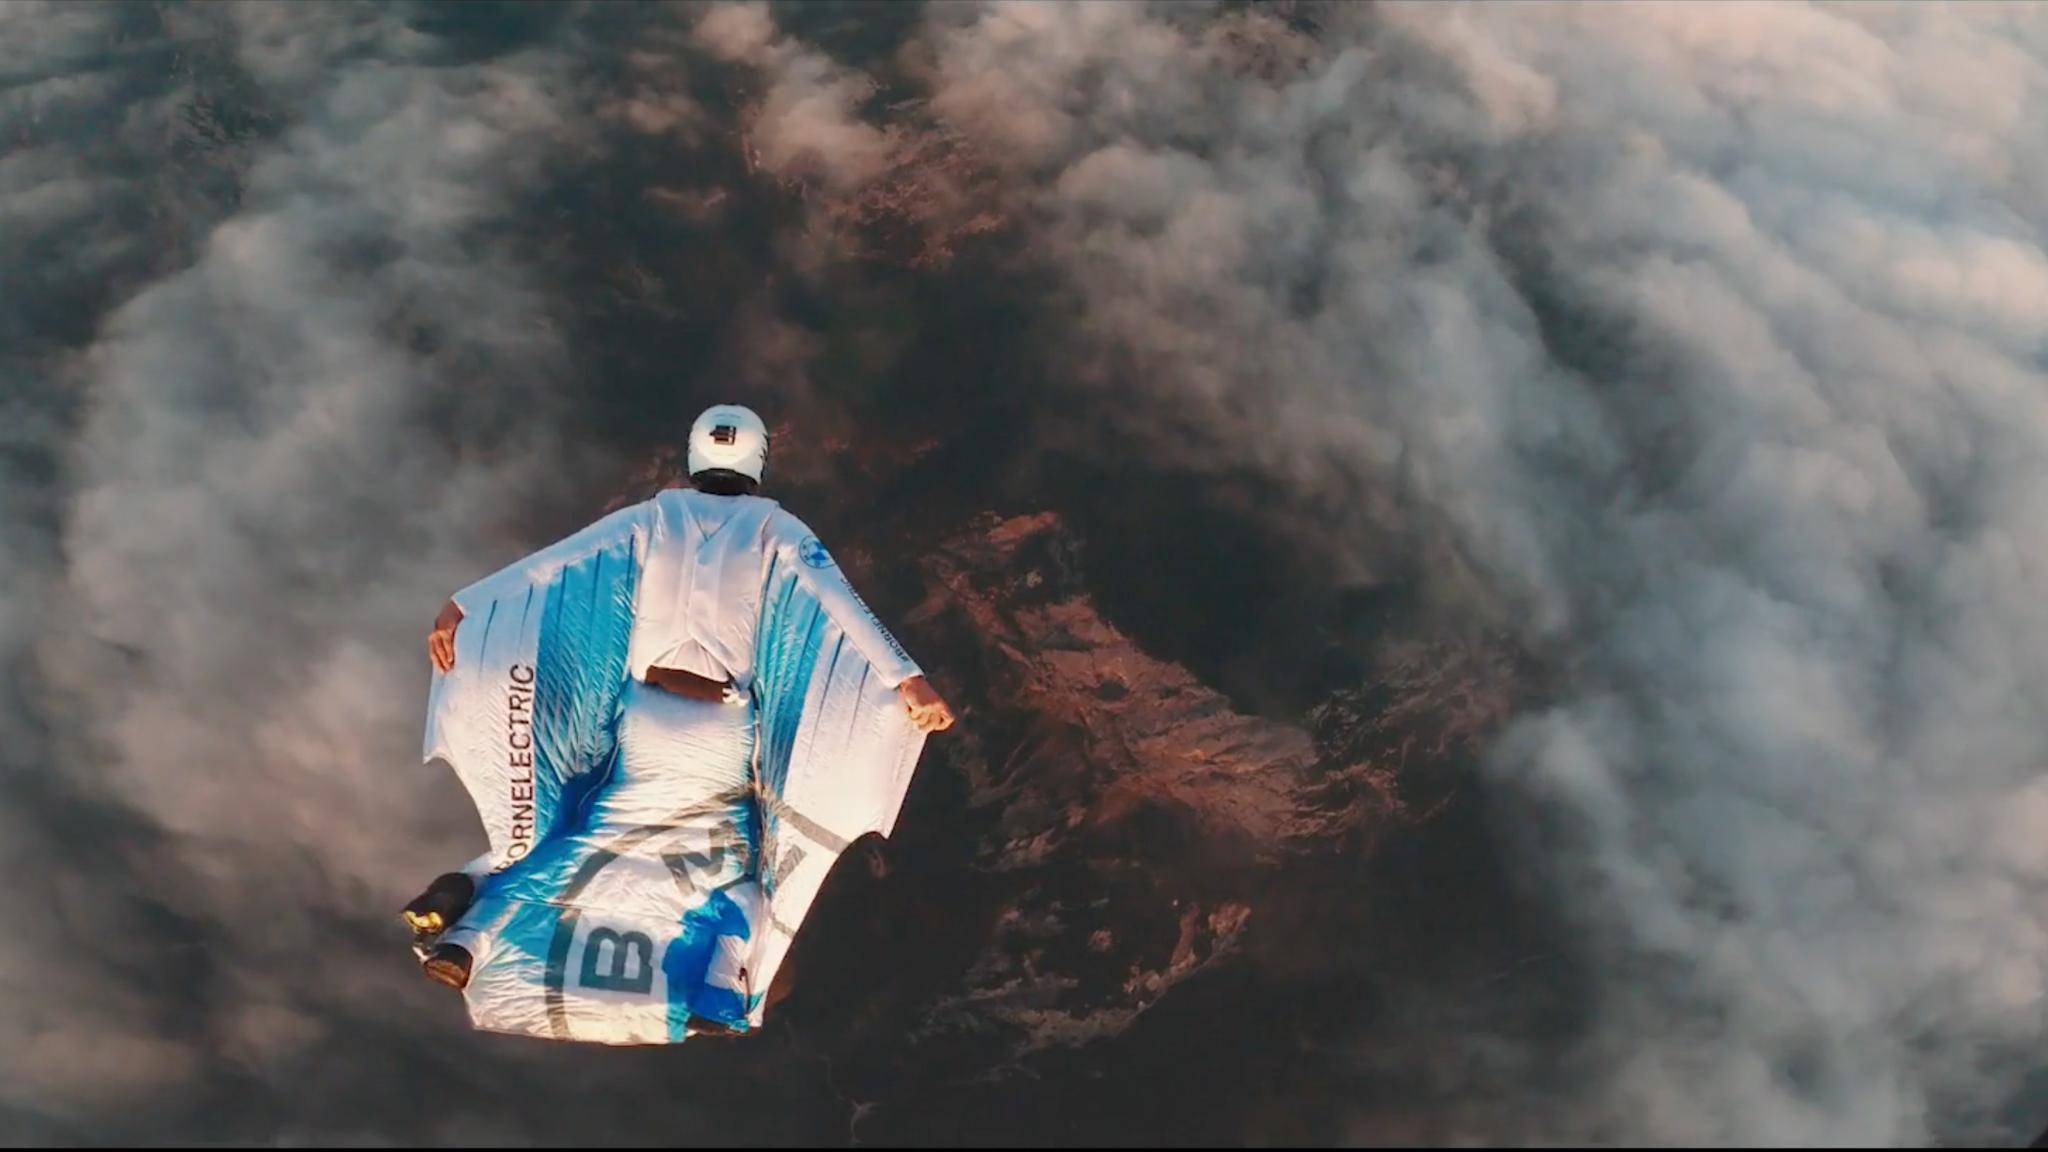 BMW iX3, The Electrified Wingsuit